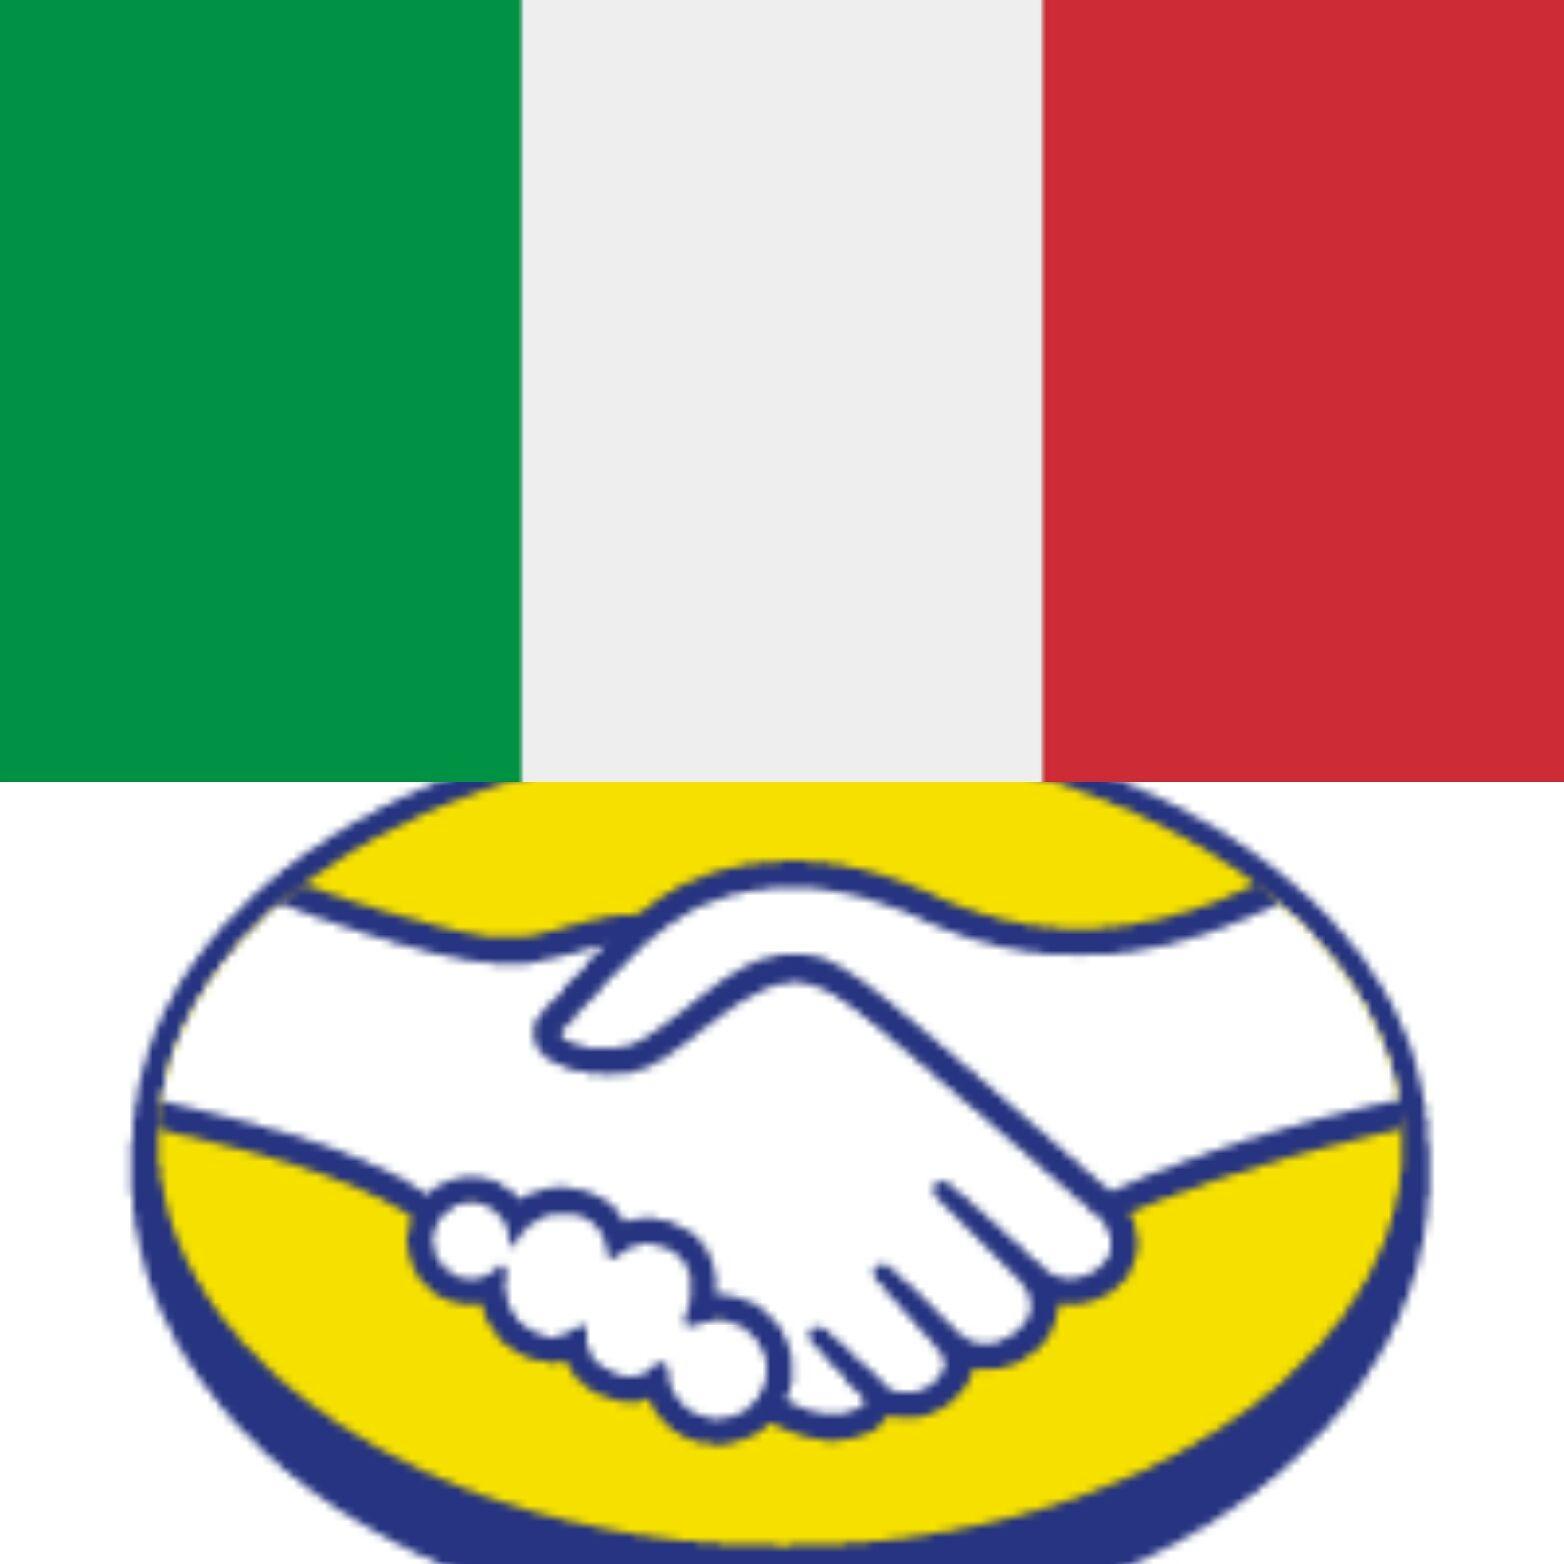 Traduttore Italiano Spagnolo Yahoo Dating